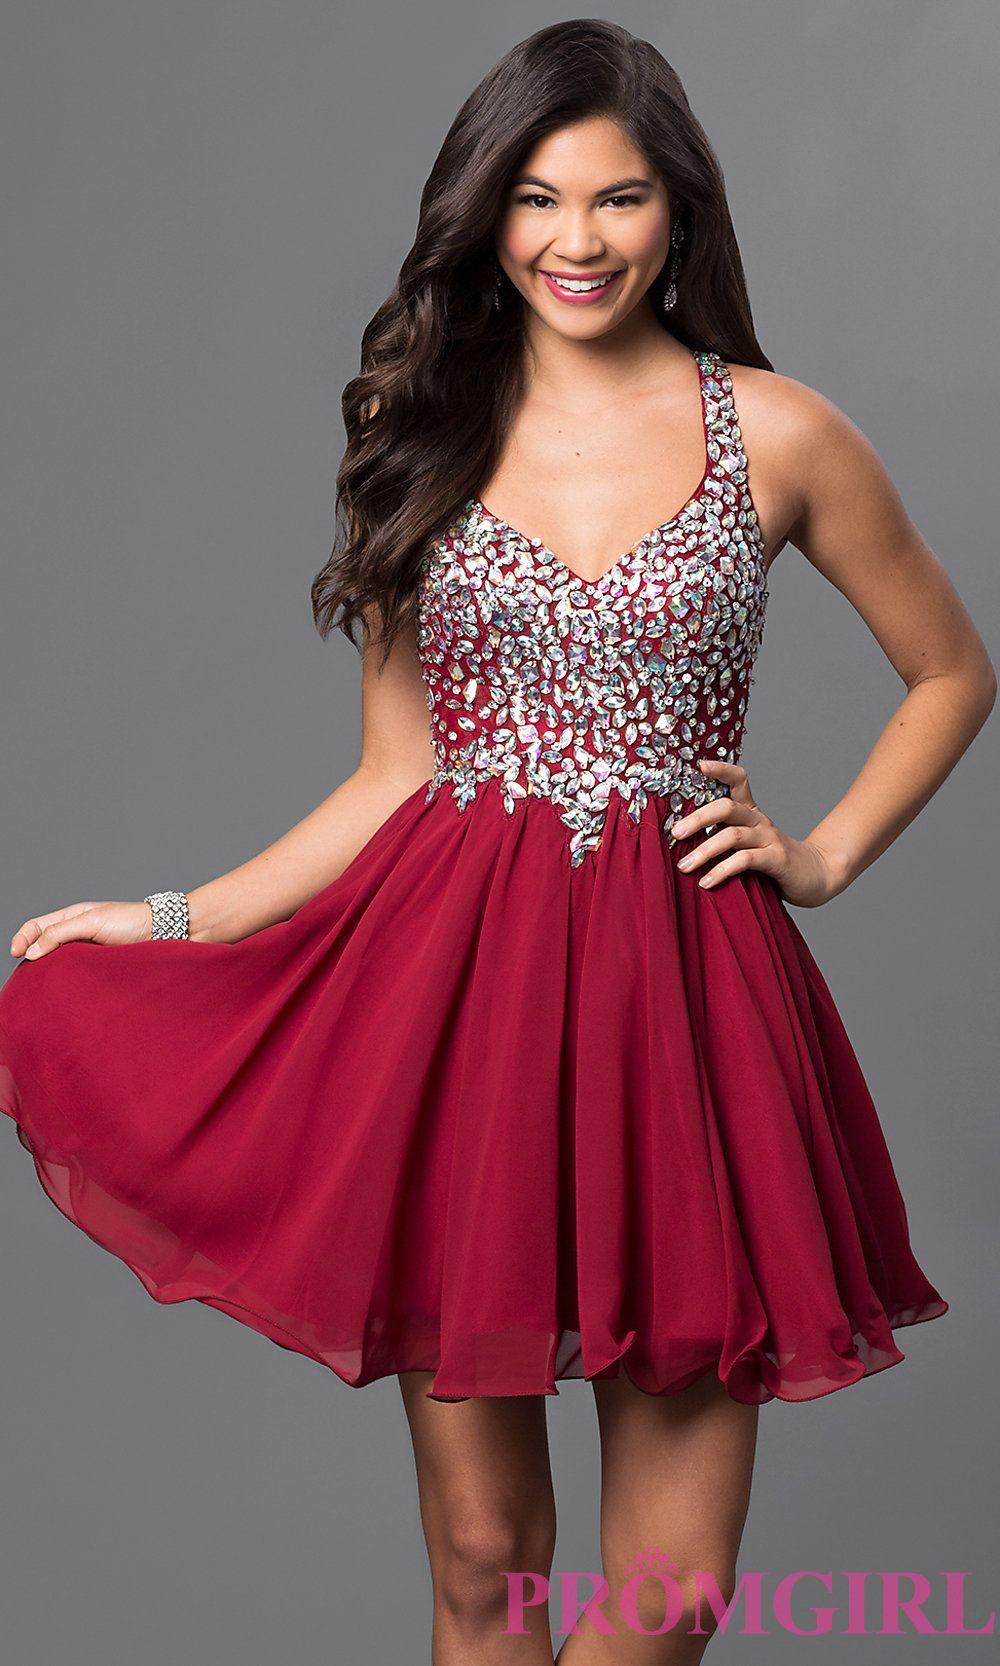 Dresses buscar con google dresses pinterest prom dresses